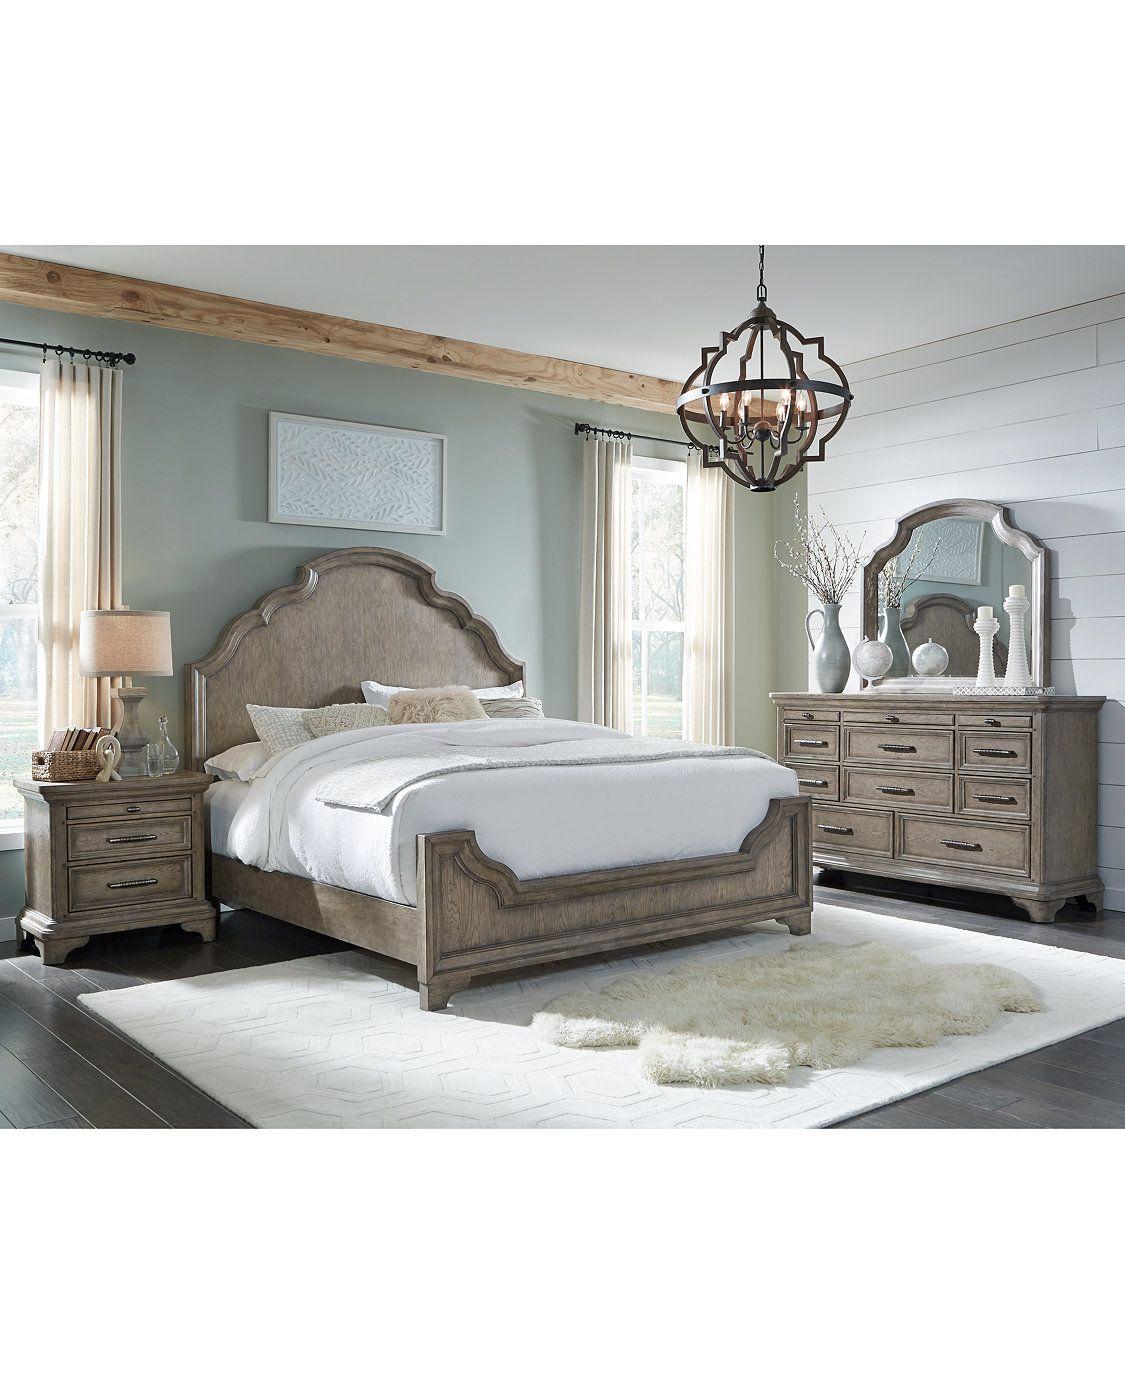 Furniture Bristol Bedroom Furniture Collection & Reviews